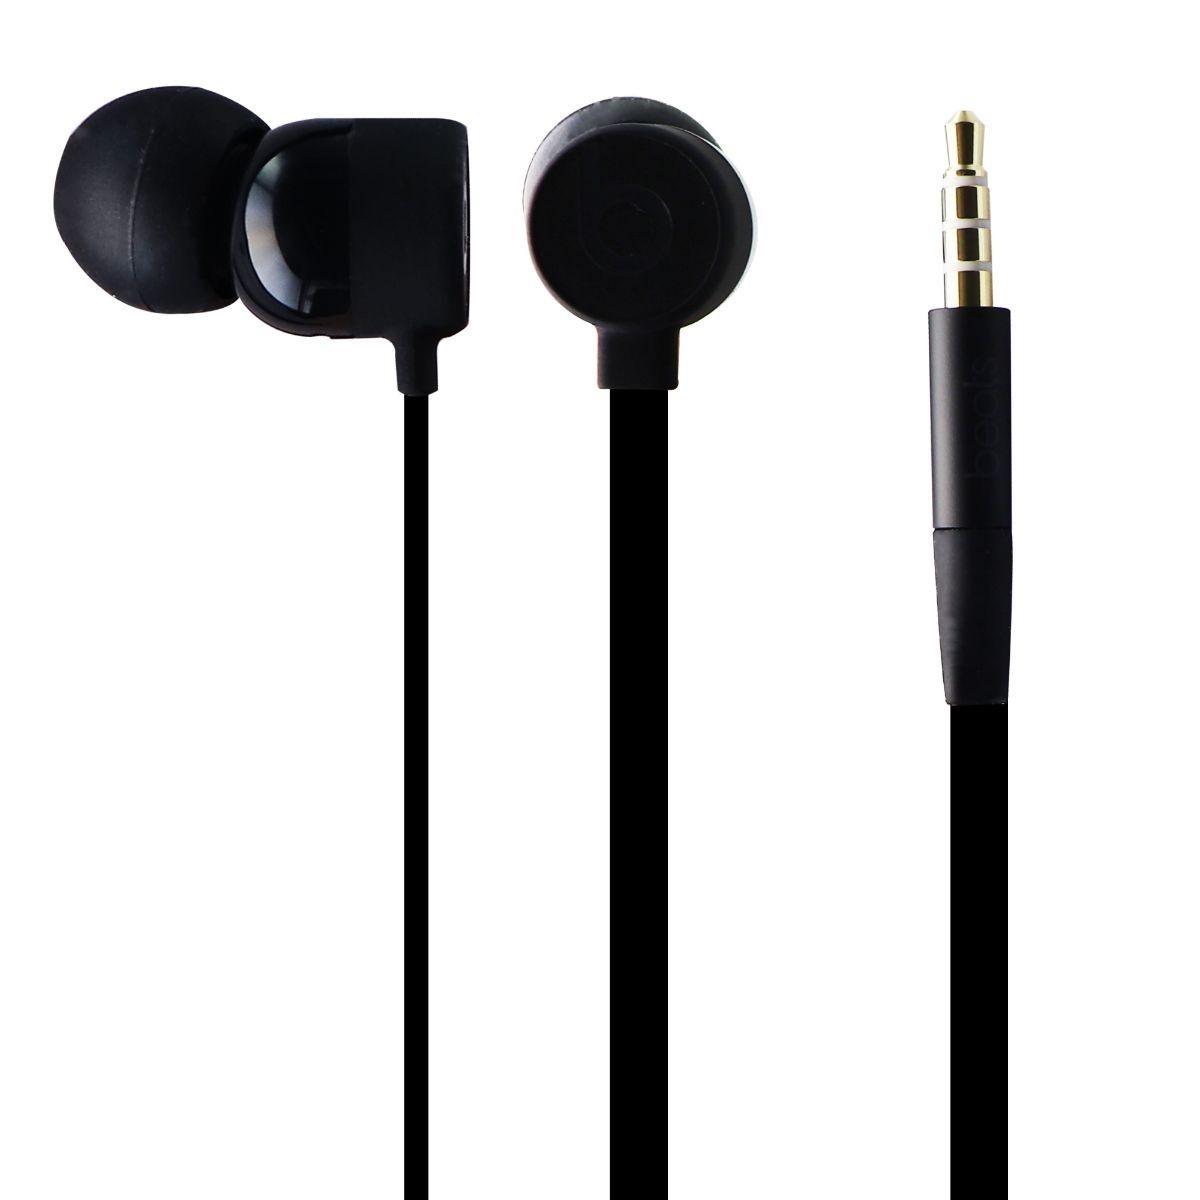 Beats by Dre. Dre urBeats3 Earphones with 3.5mm Plug - Black (MU982LL/A)